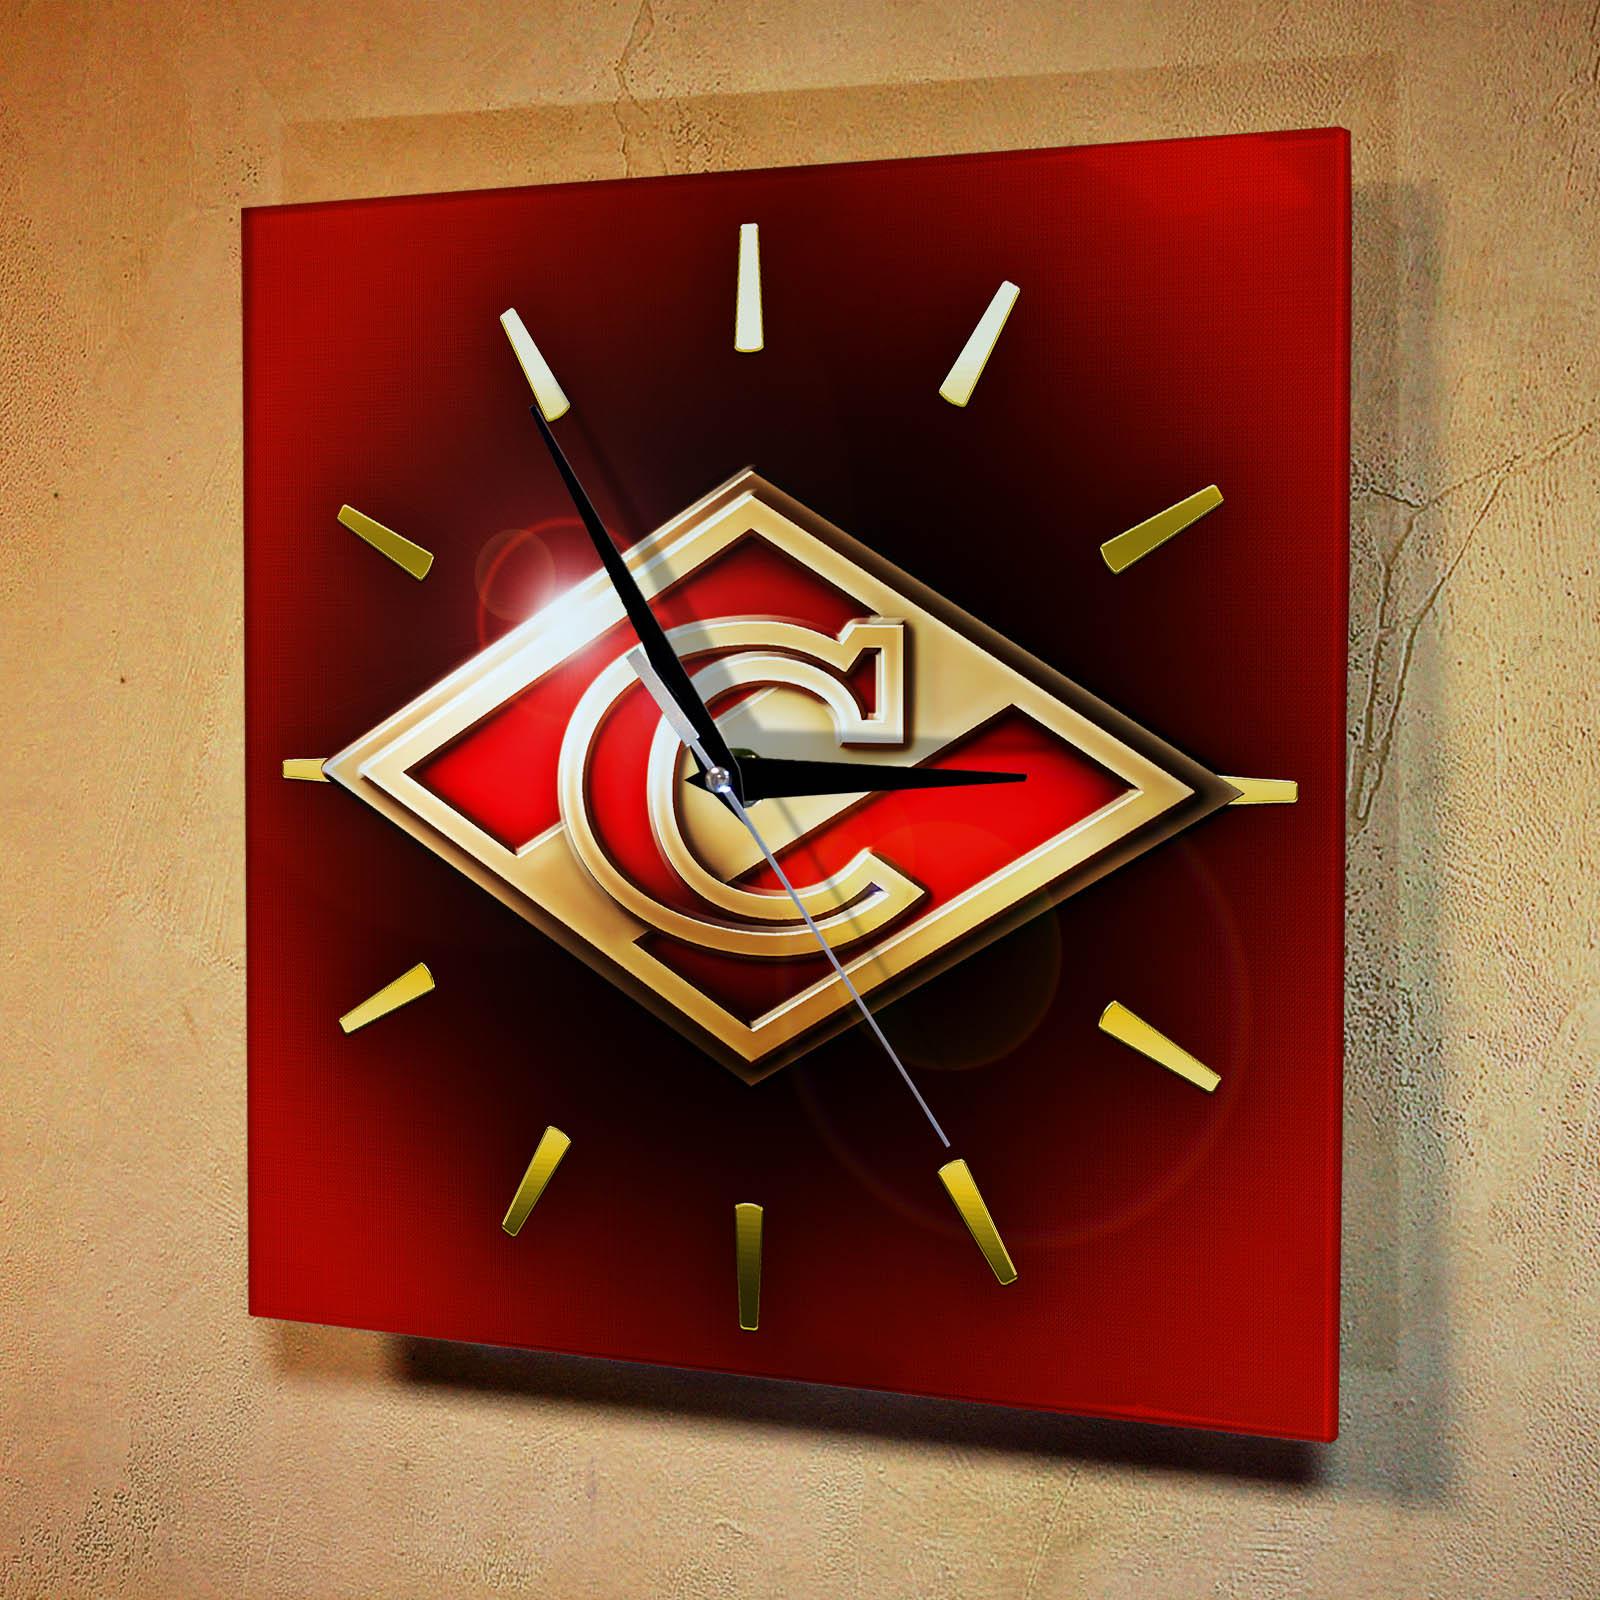 spartak_012_0002_wall-clock-2